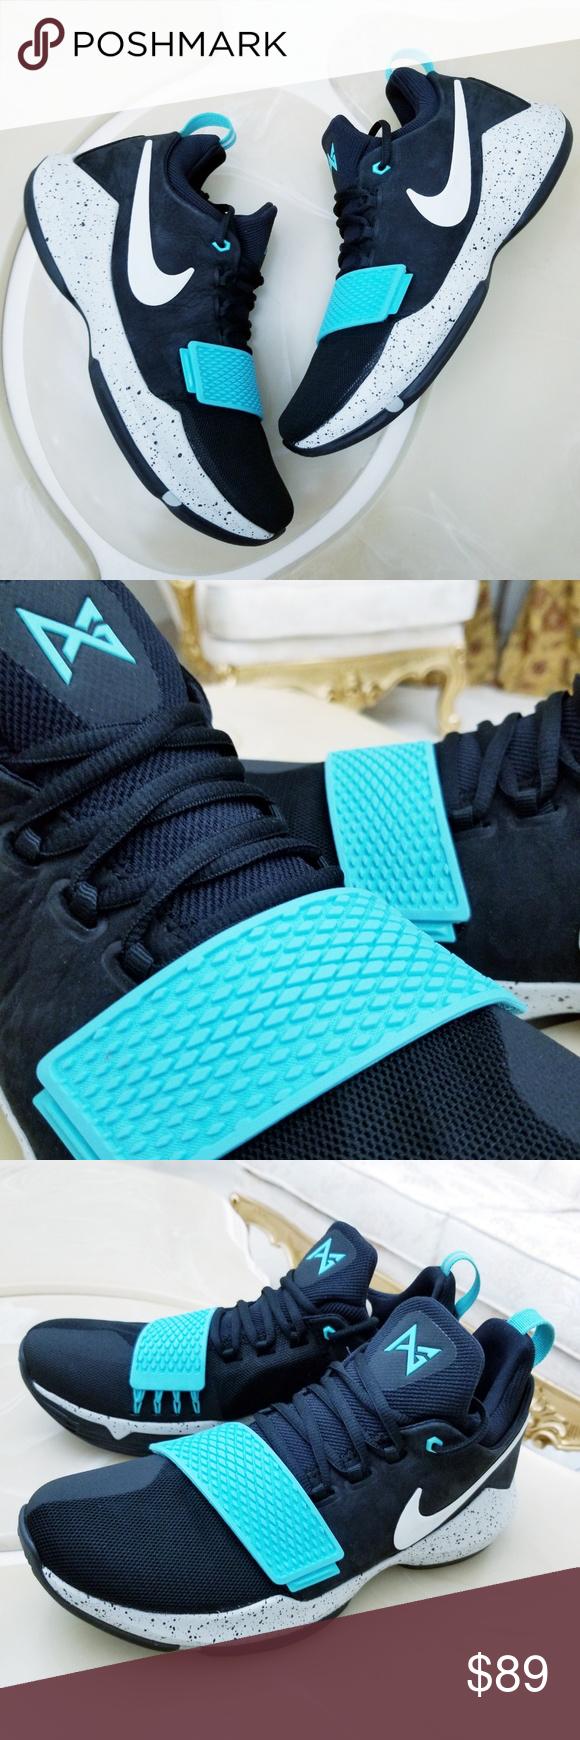 Nike PG 1 NBA Paul Signature Sneaker New With Box